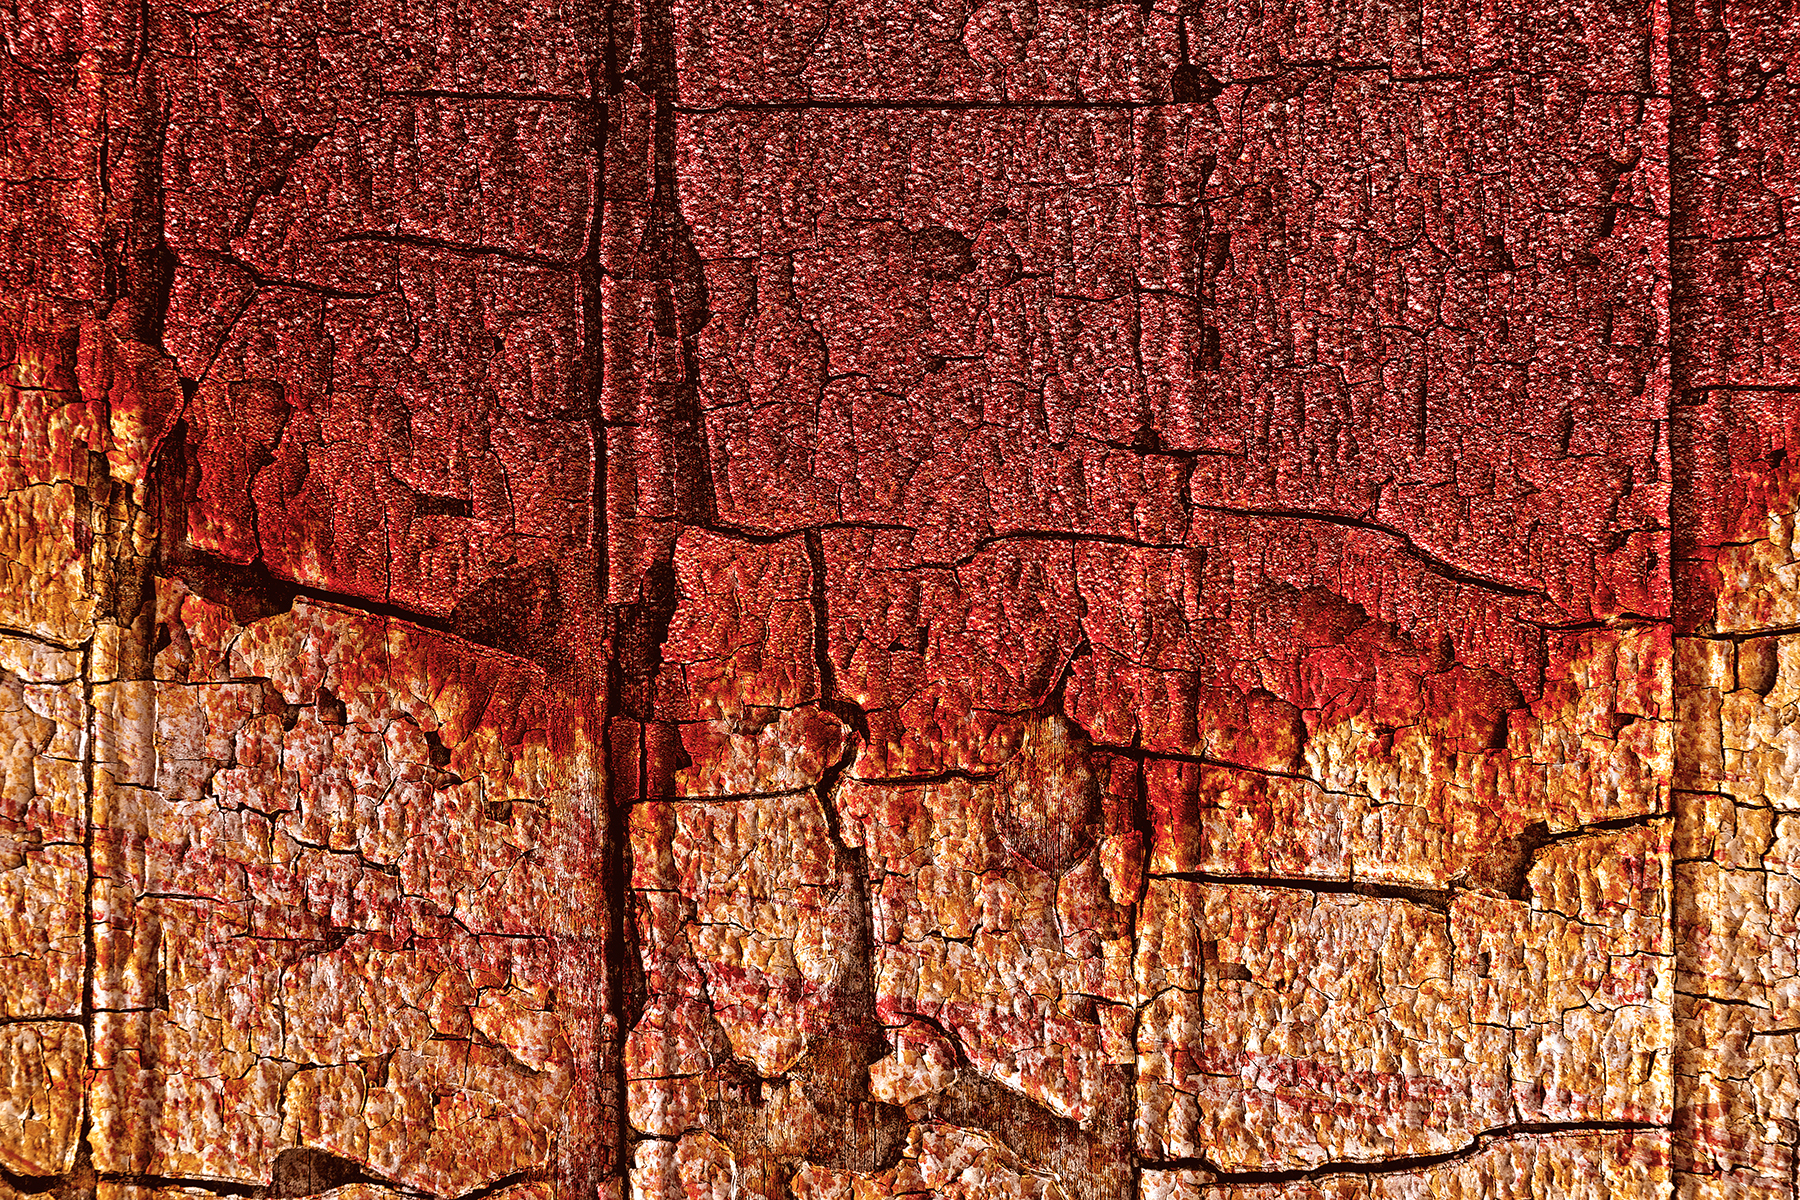 Vibrant wood decay photo